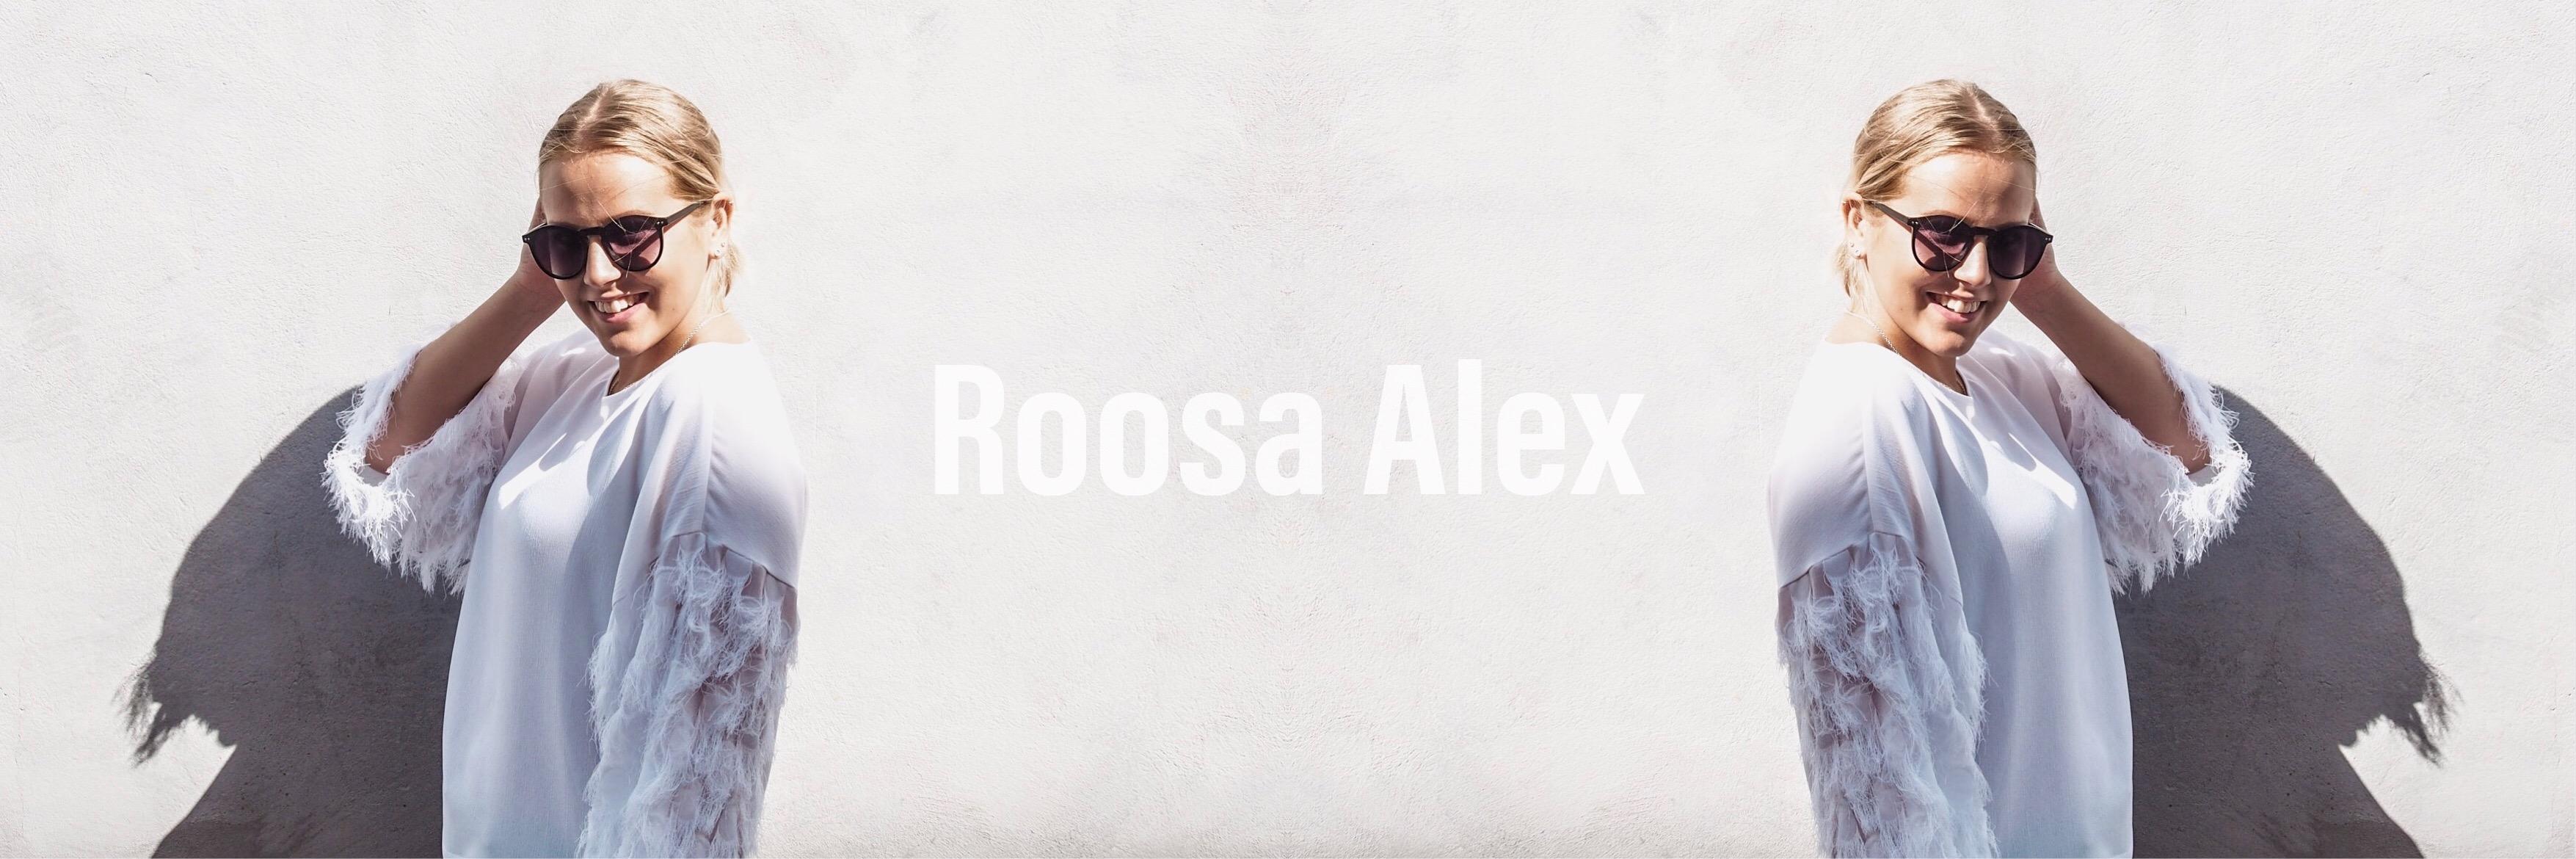 Roosa Alex